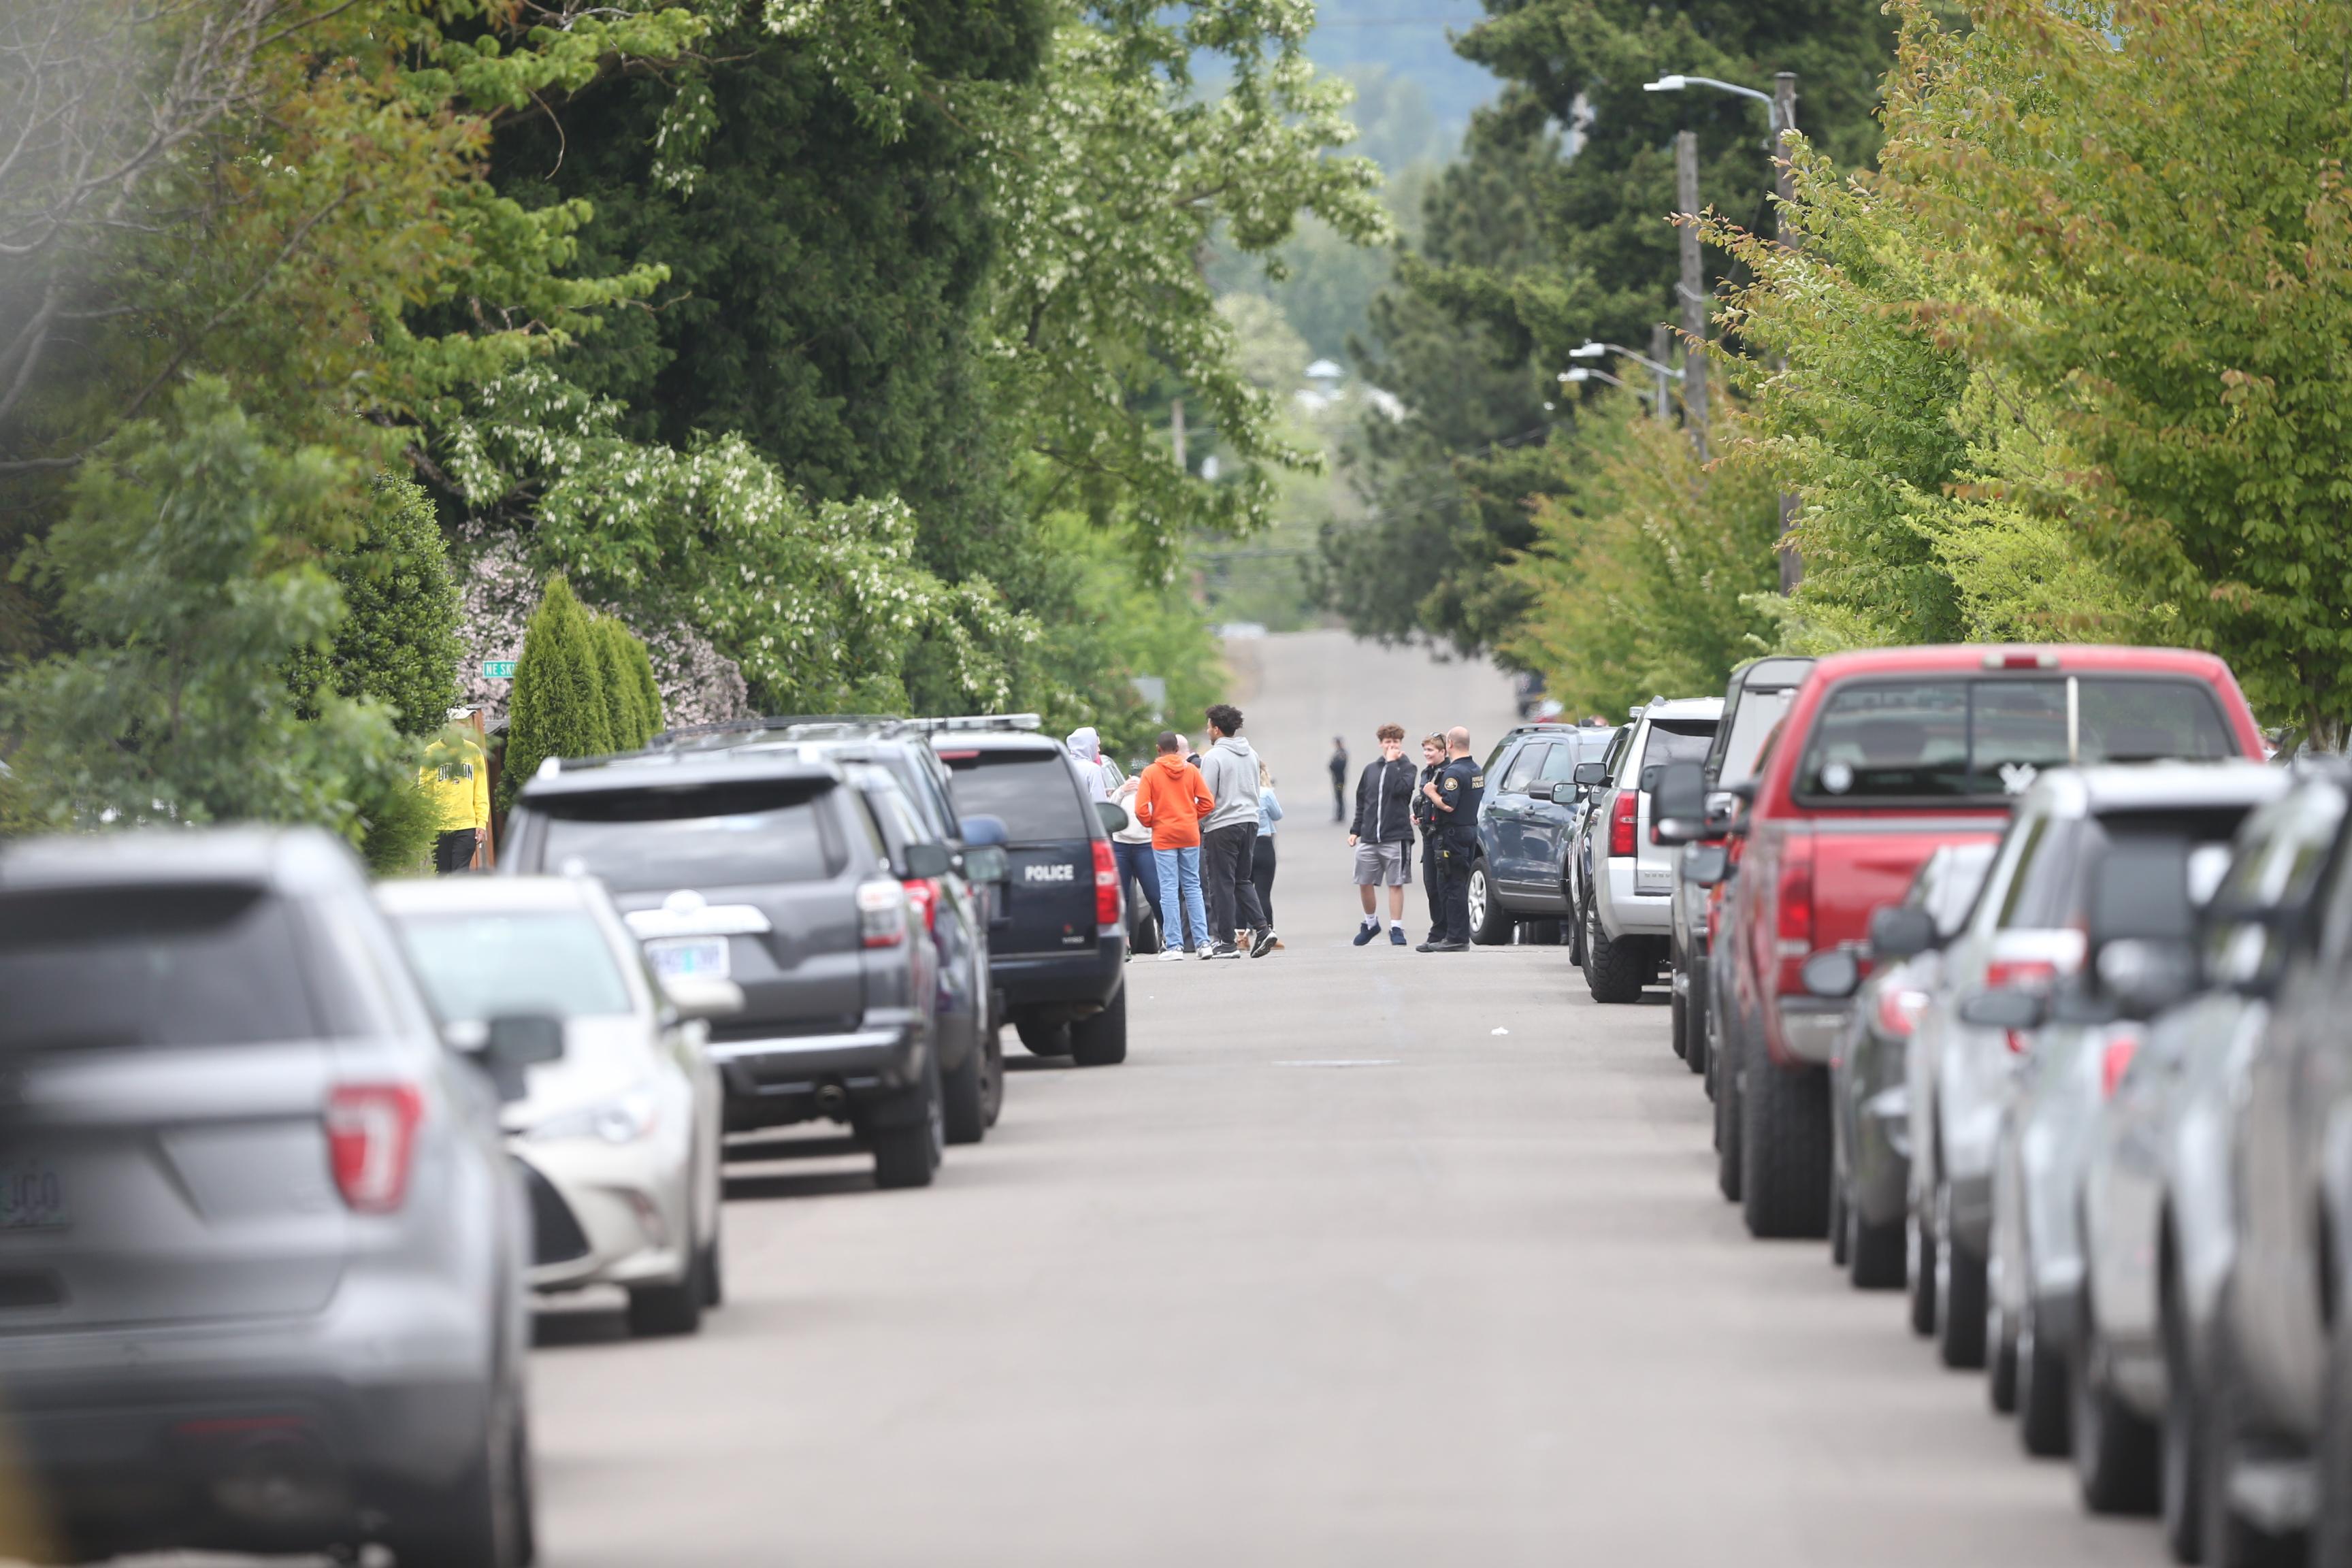 Keanon Lowe, former Oregon Ducks star, wrestles suspect to